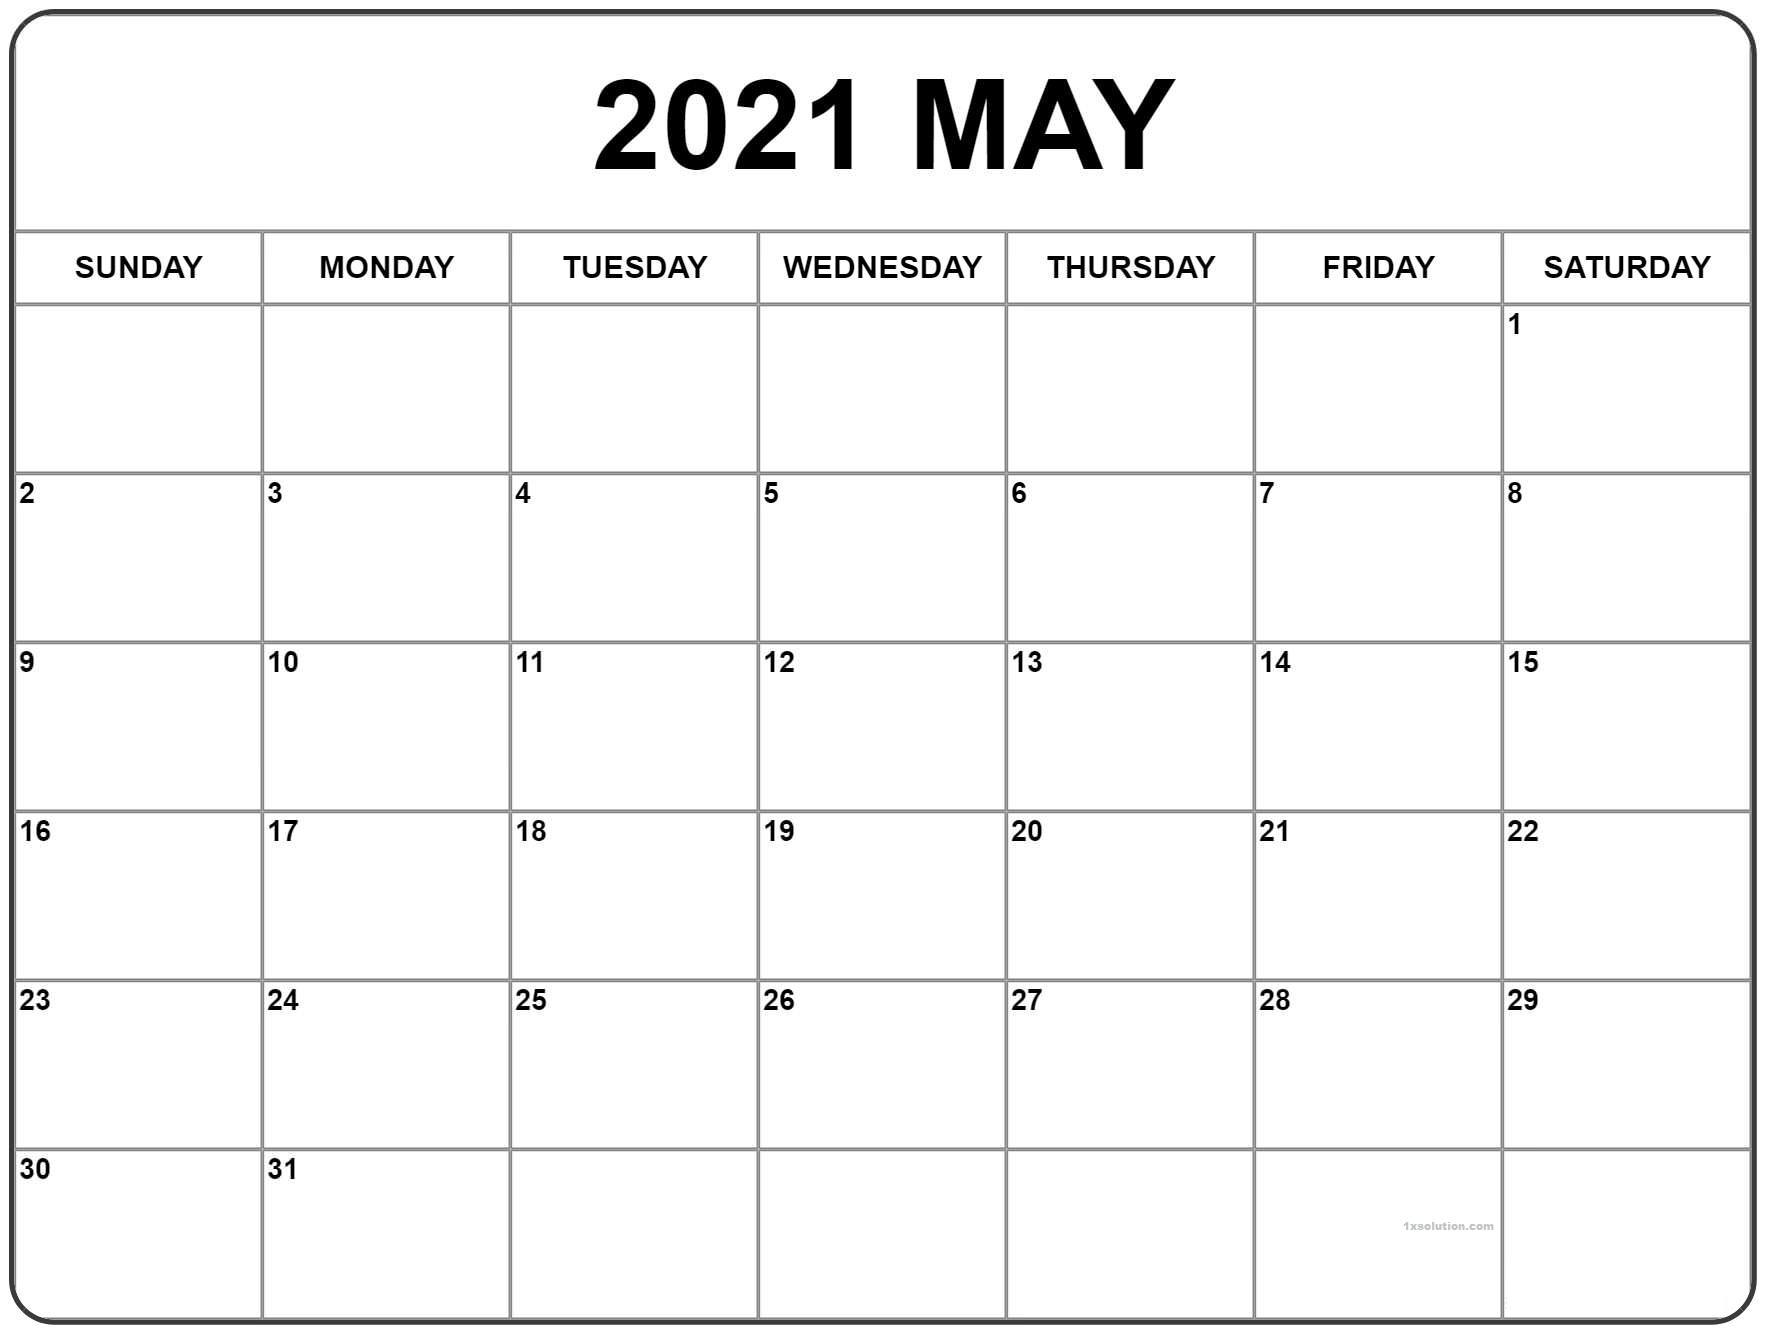 May 2021 Calendar Planner